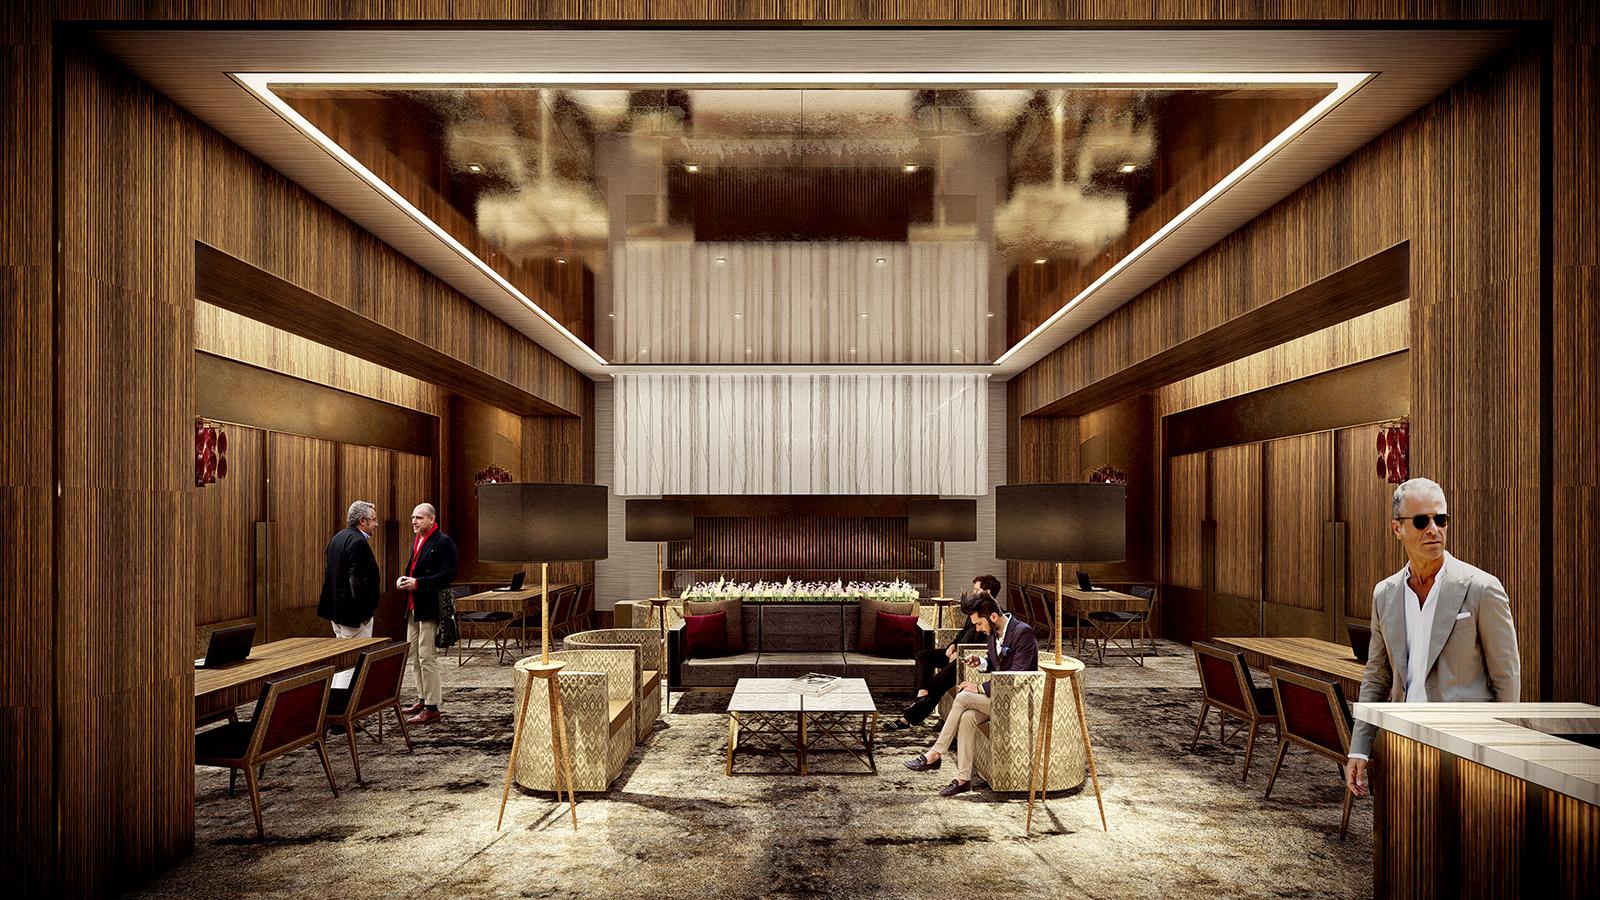 Hotel Concierge Architecture 1600x900